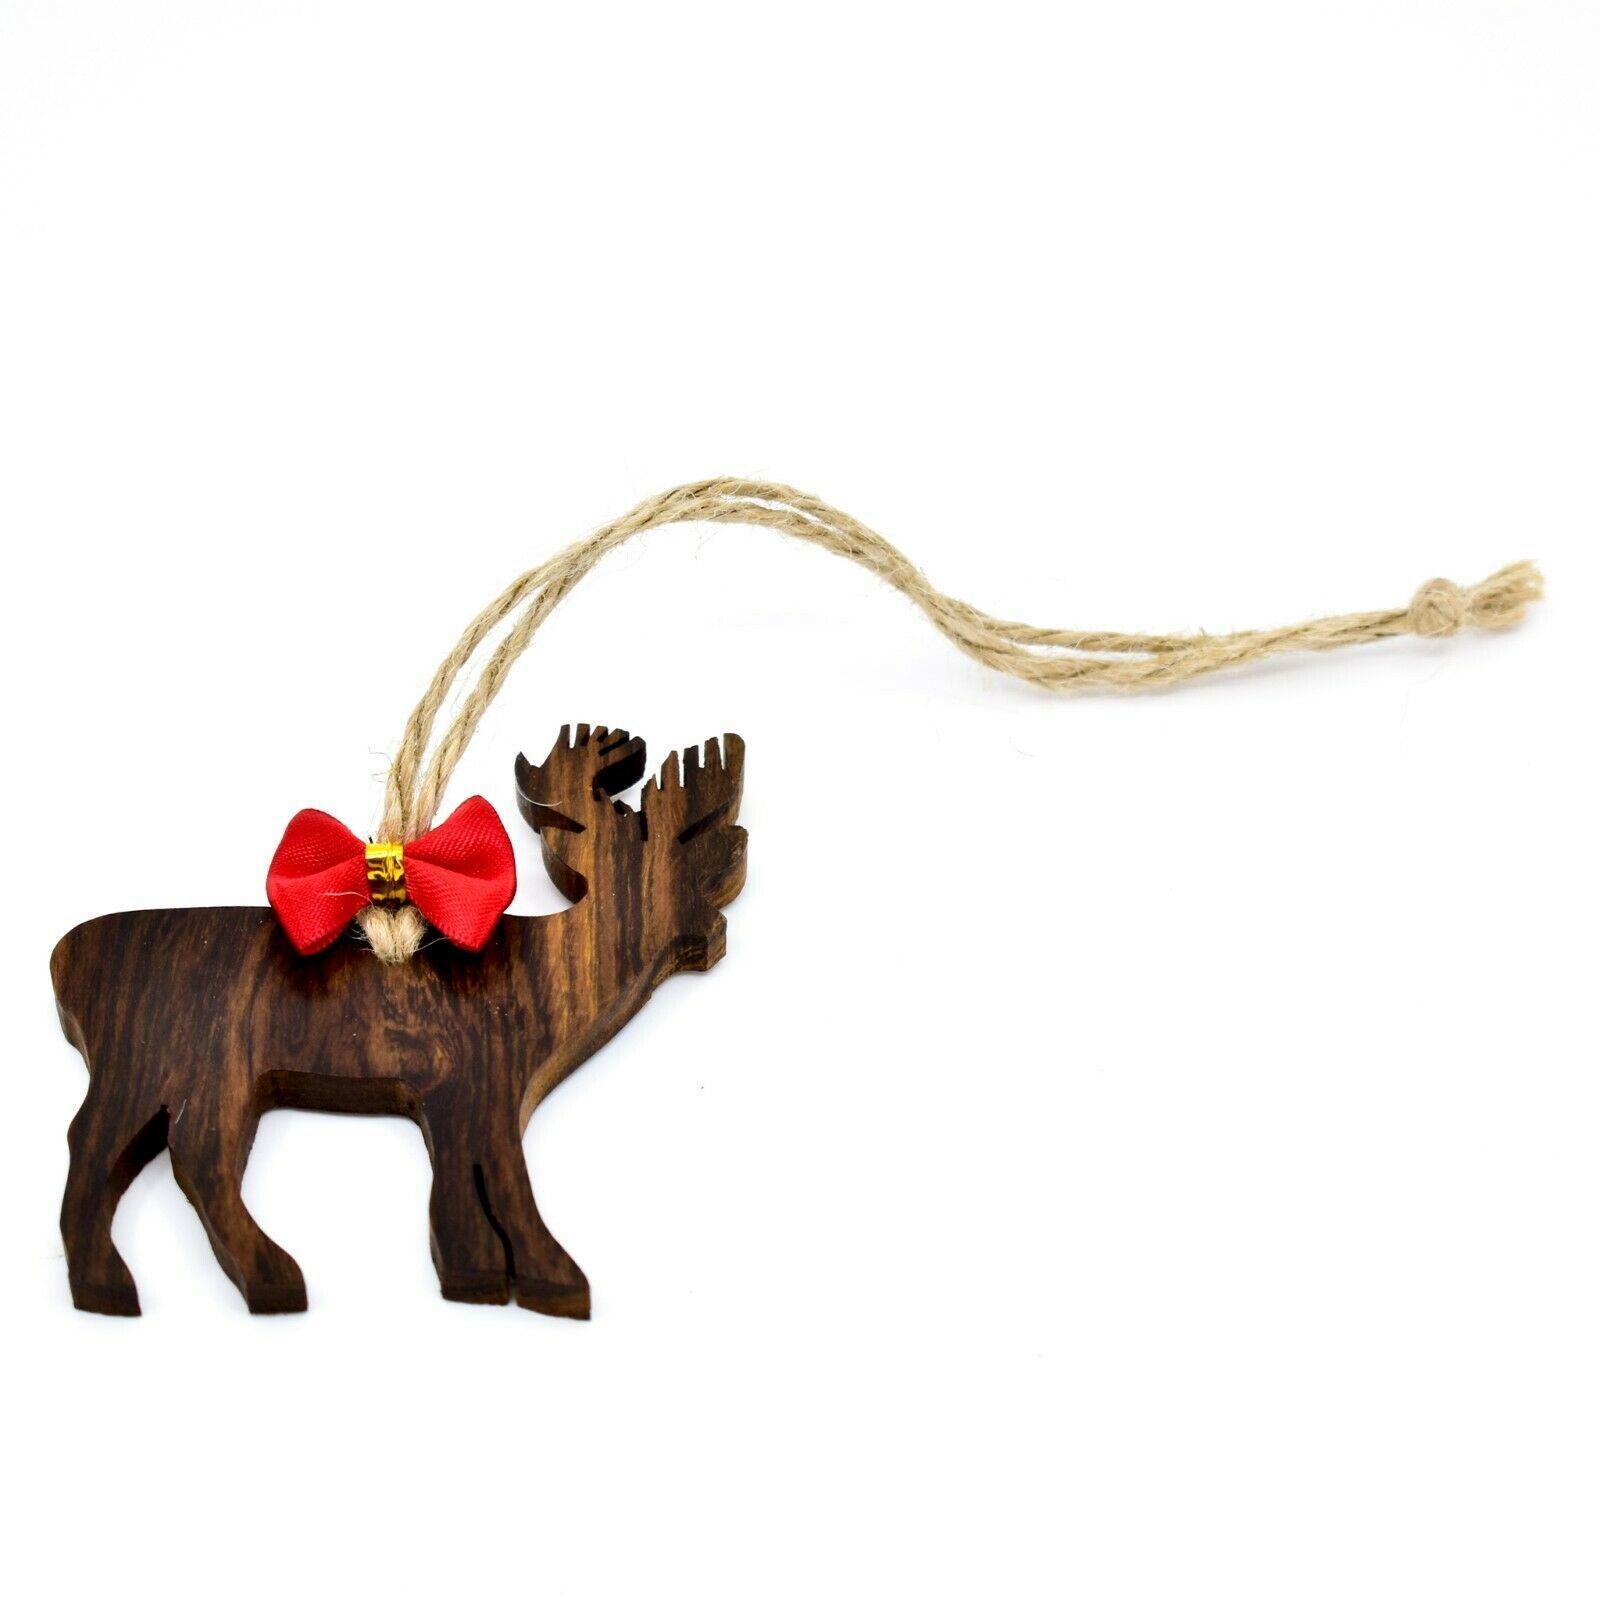 Hand Carved Ironwood Wood Folk Art Deer Silhouette Christmas Ornament